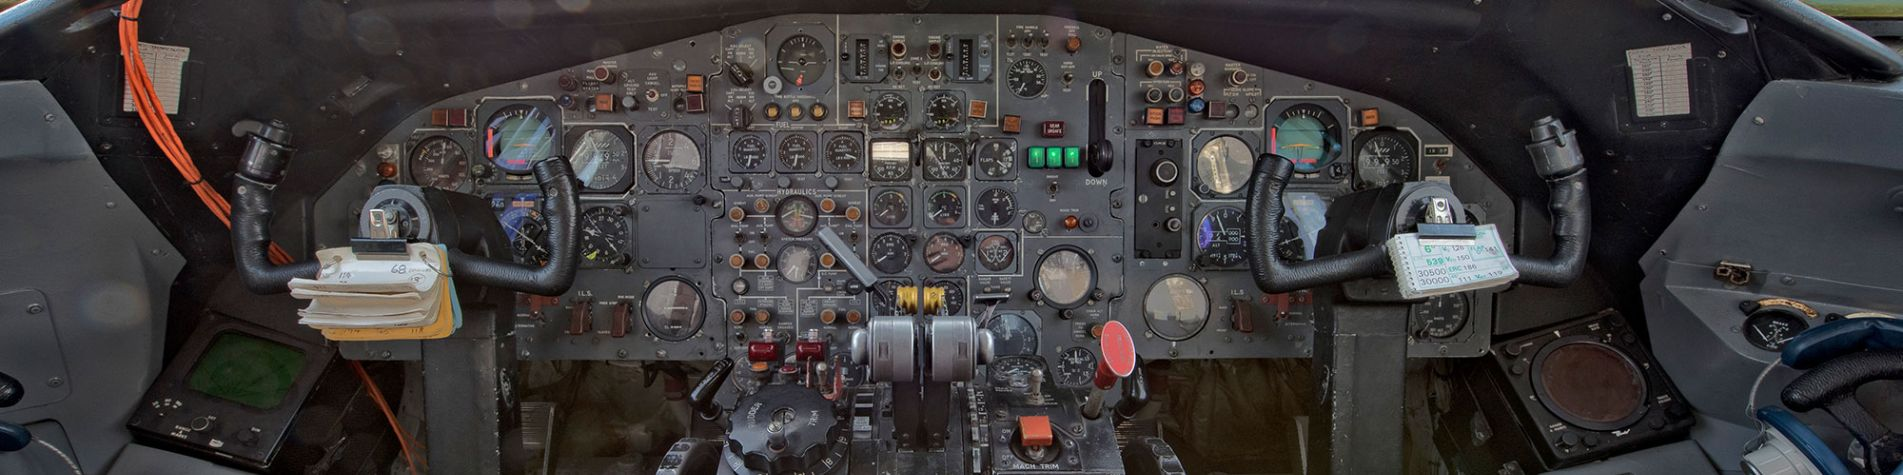 bac-1-11-cockpit-header-zoom.jpg